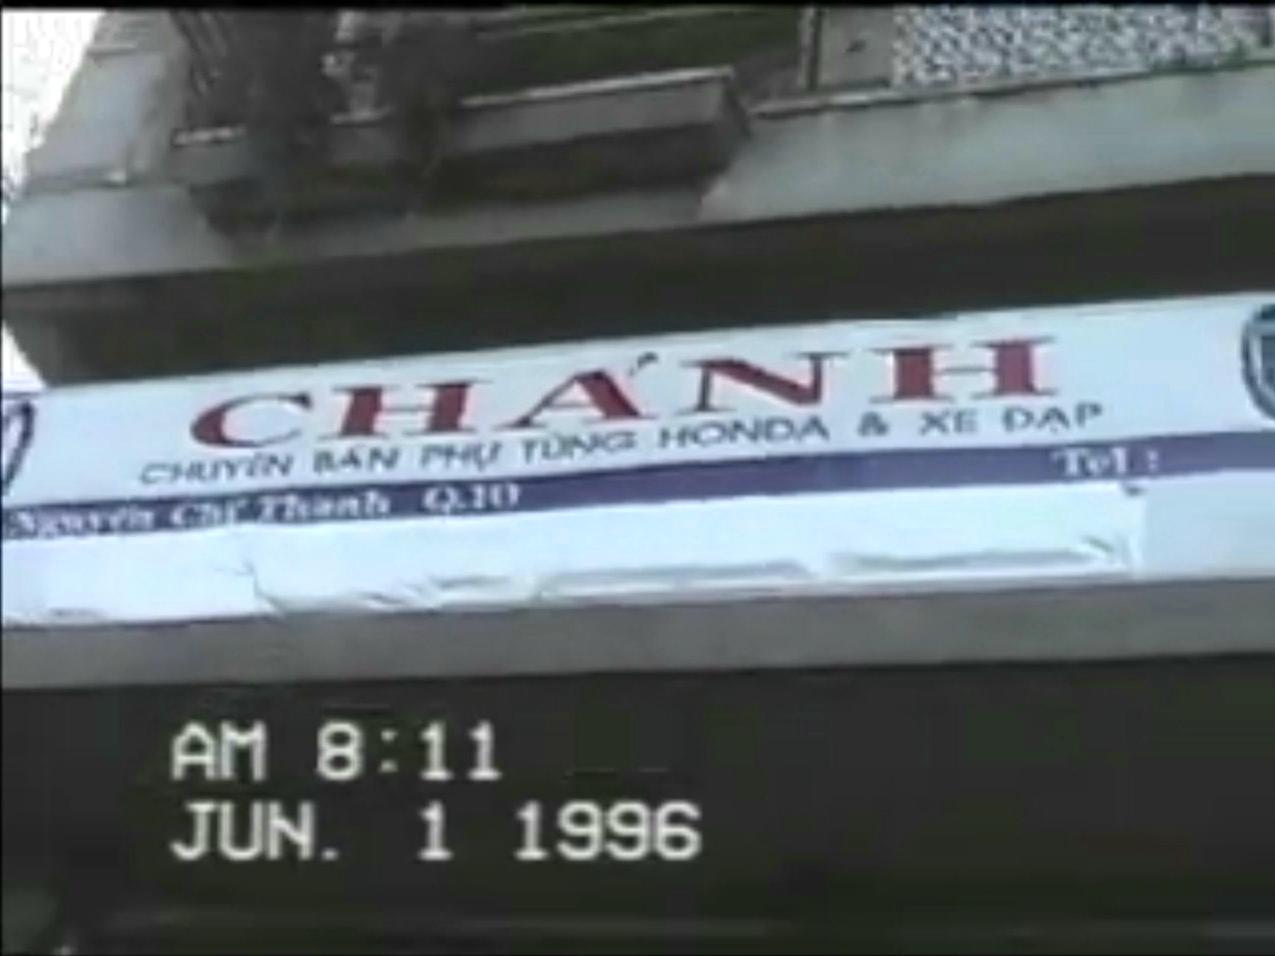 phu-tung-xe-may-quan-10-Chanh